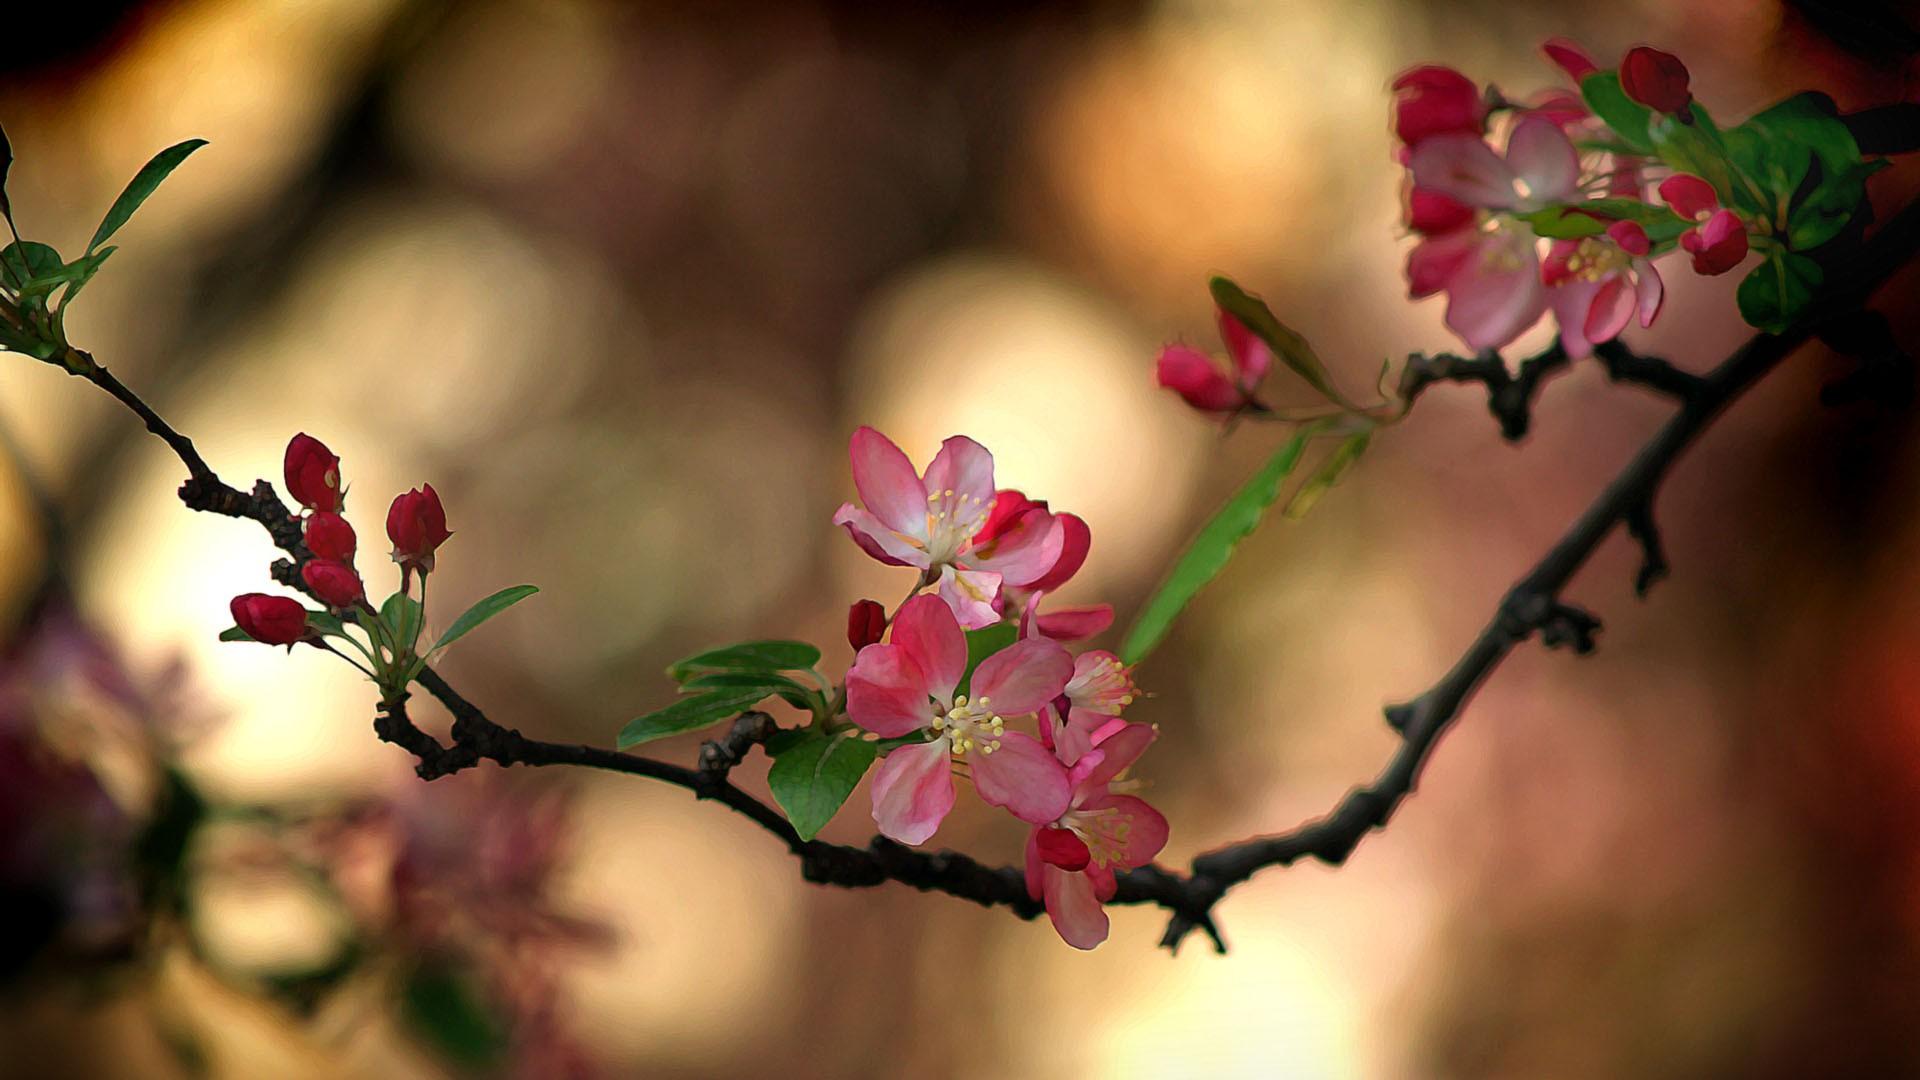 обои на телефон весна природа самсунг мосс предстояло парить